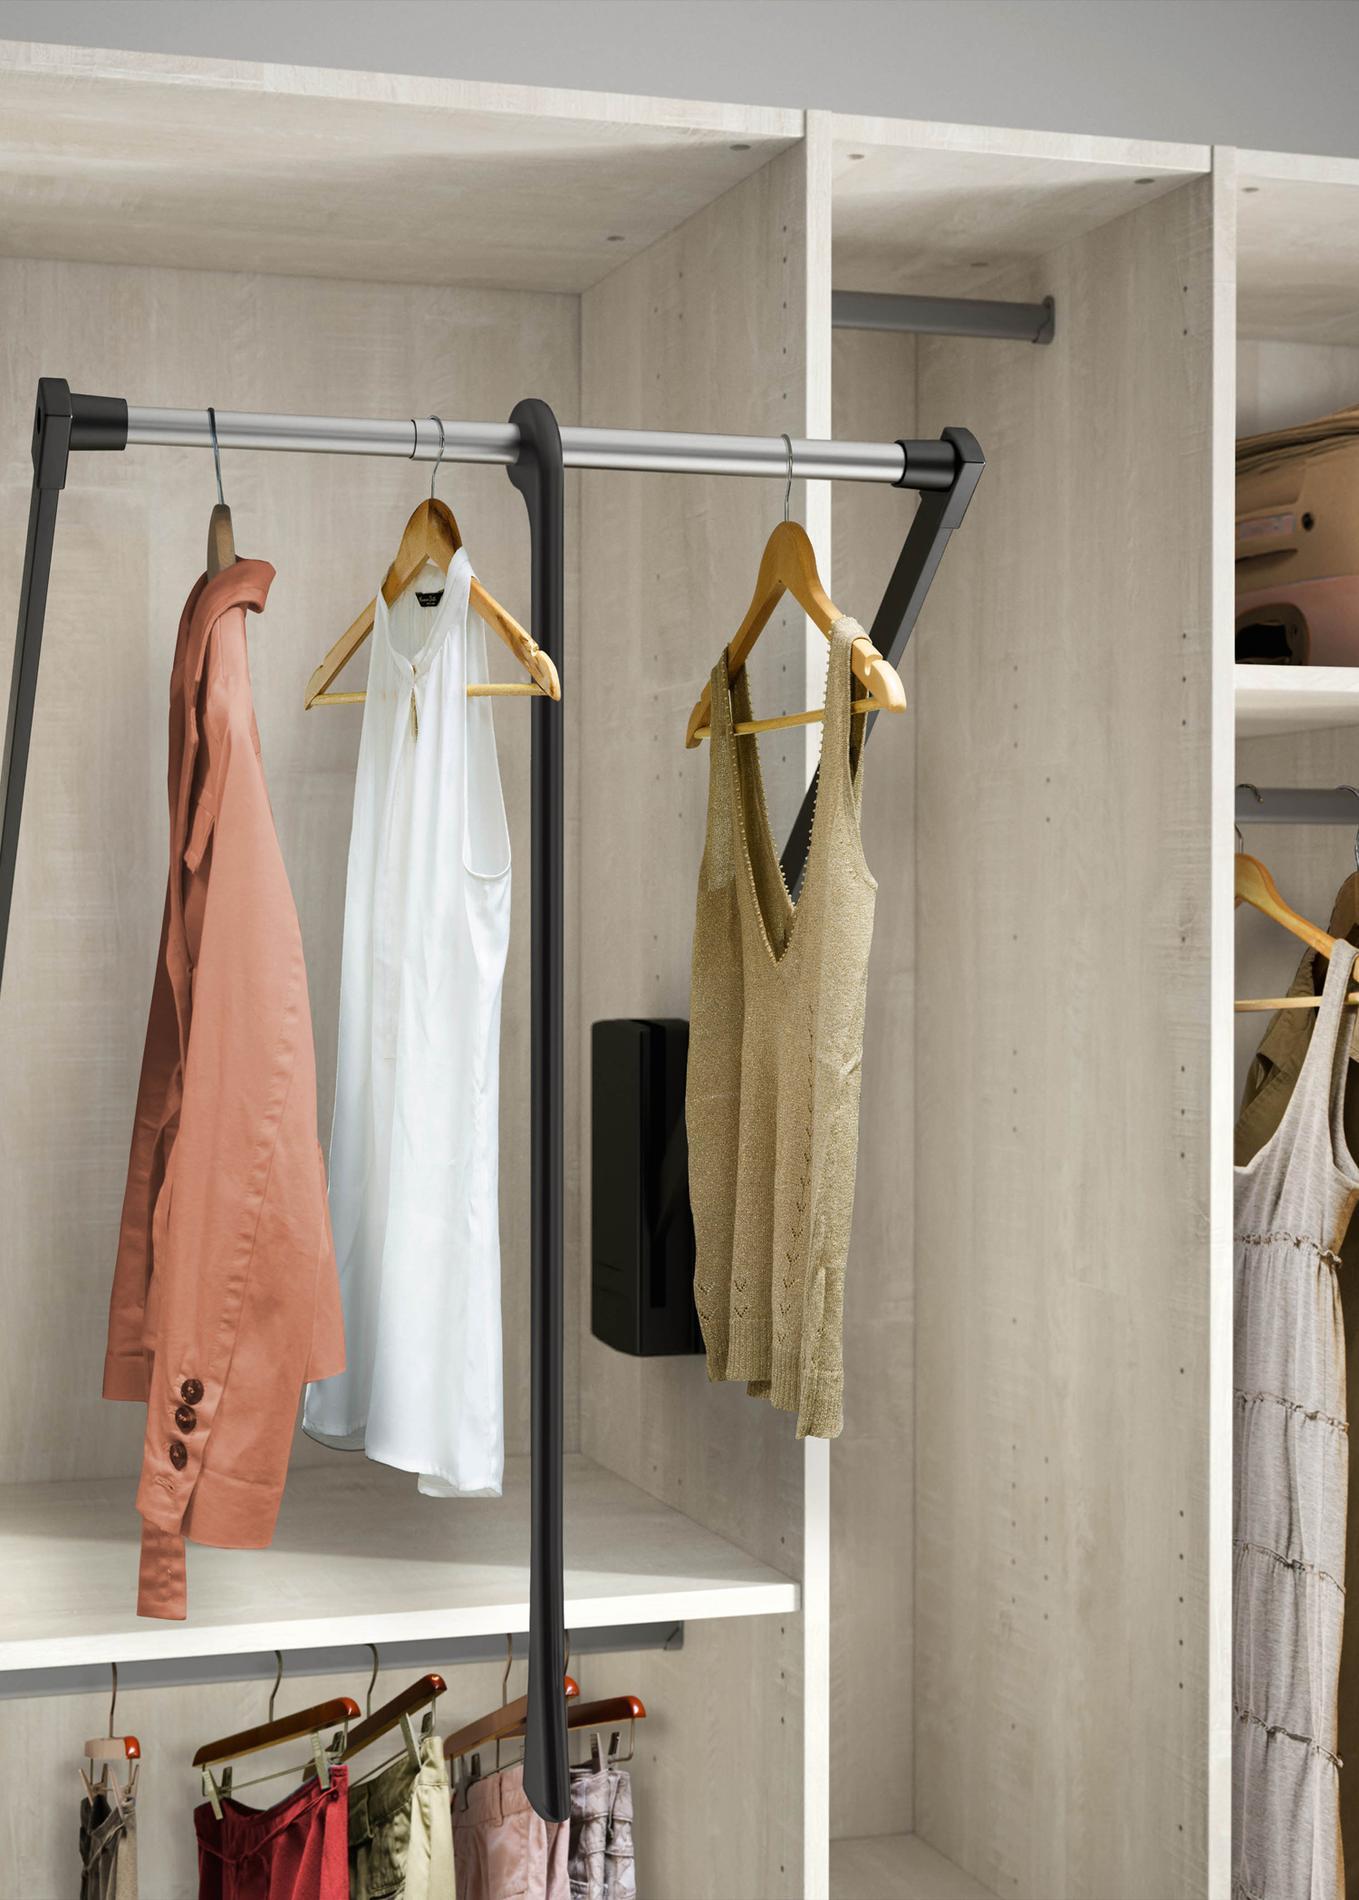 modele de dressing a faire soi meme xw07 jornalagora. Black Bedroom Furniture Sets. Home Design Ideas